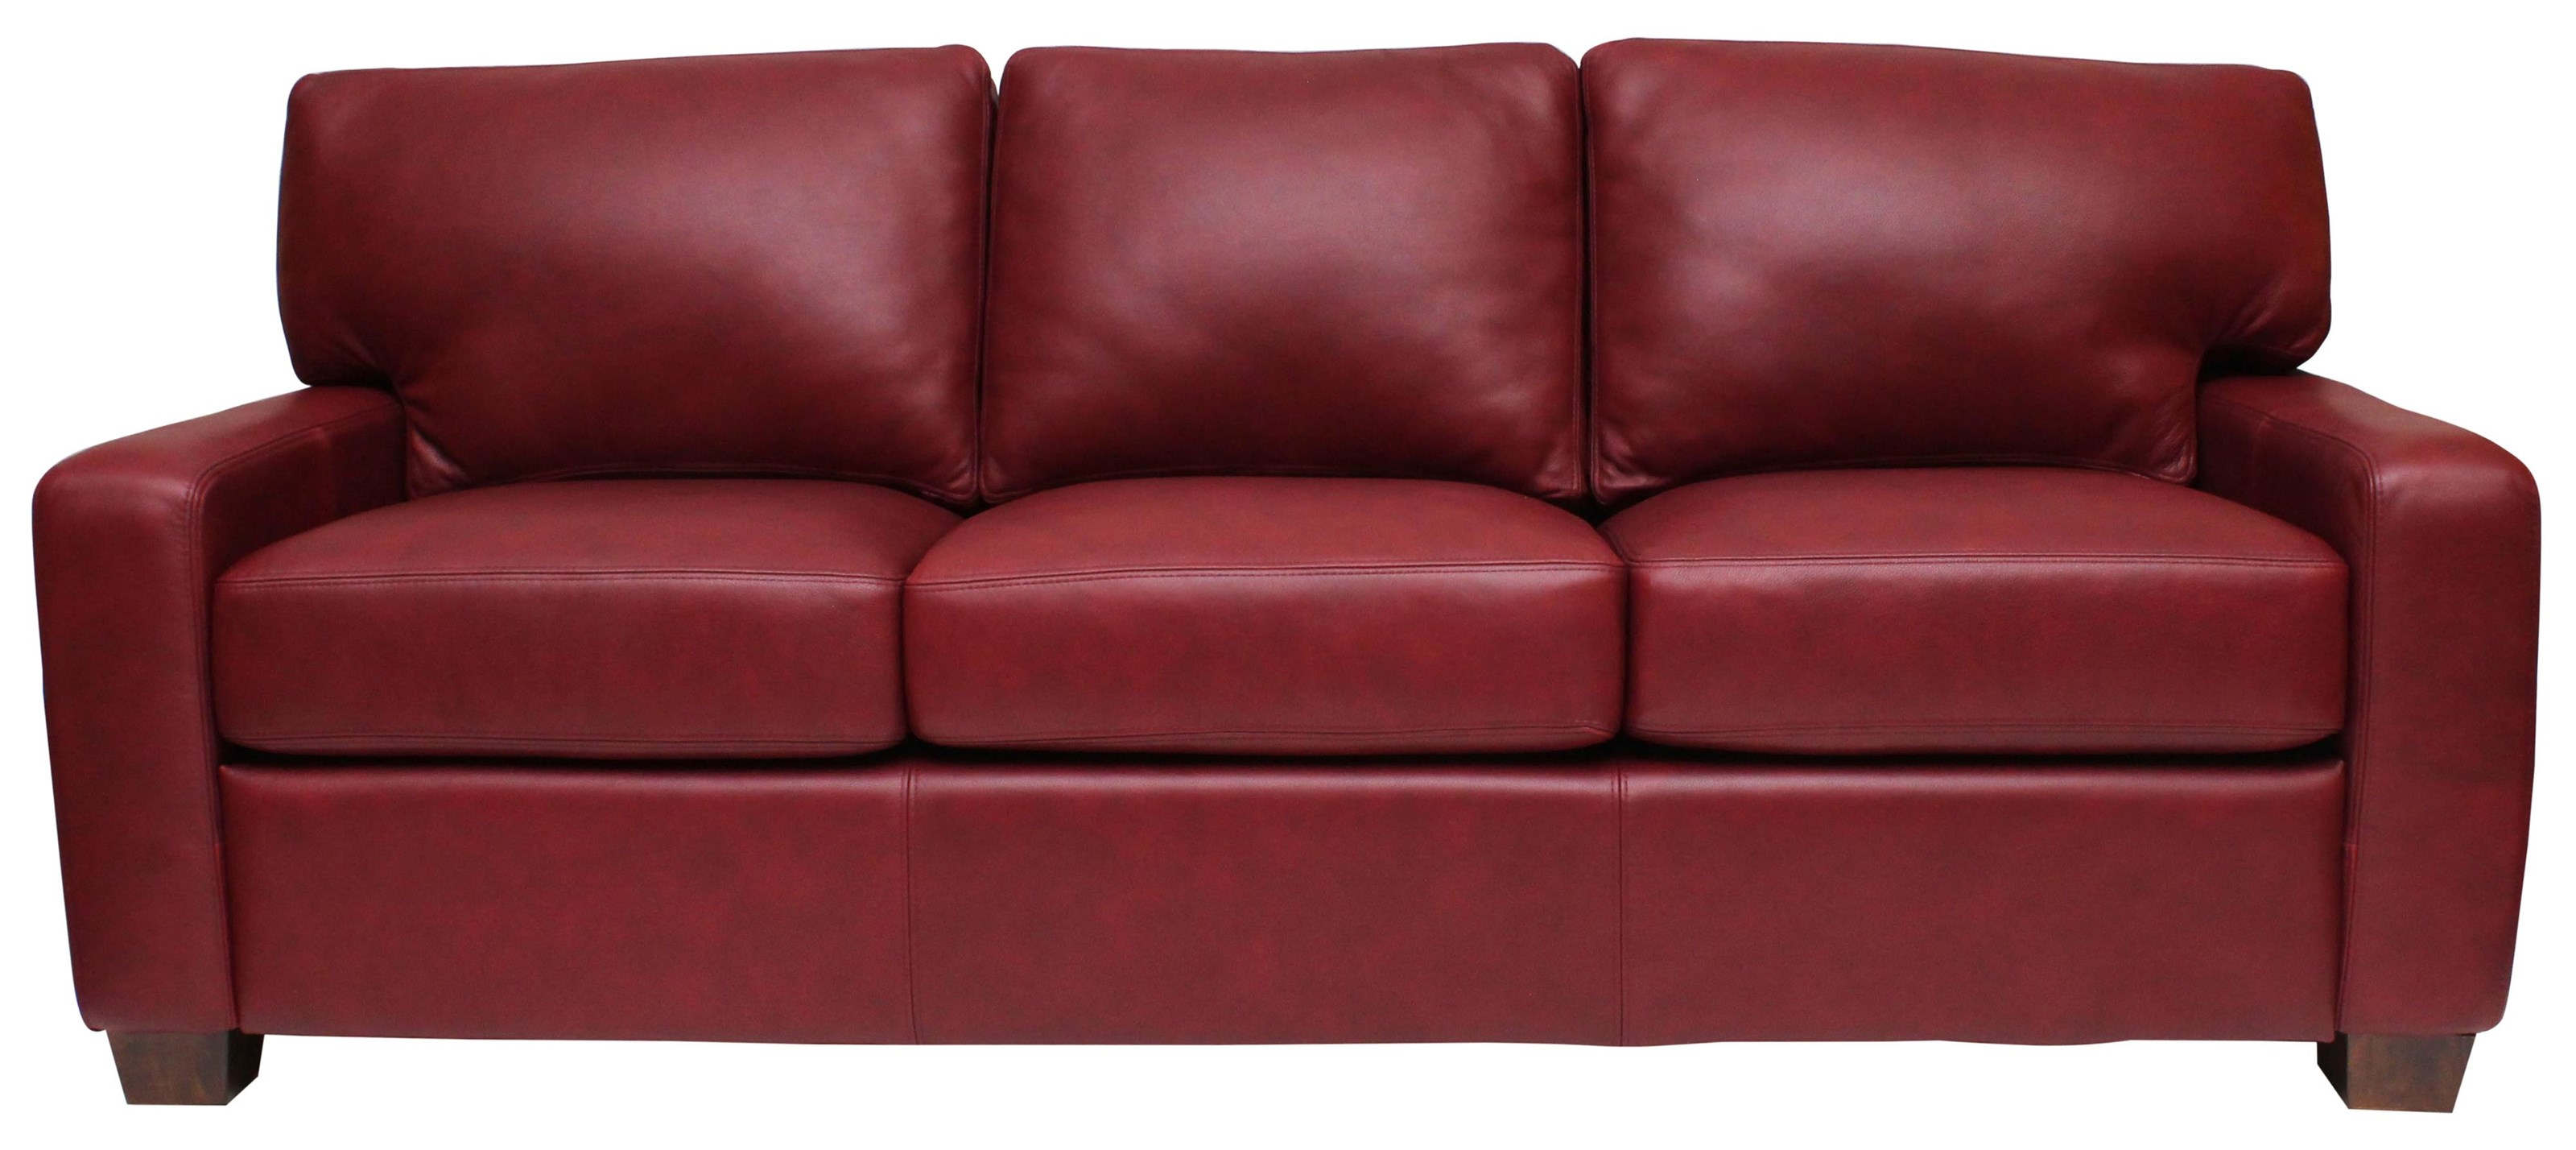 Albany Sofa by Omnia Leather at HomeWorld Furniture